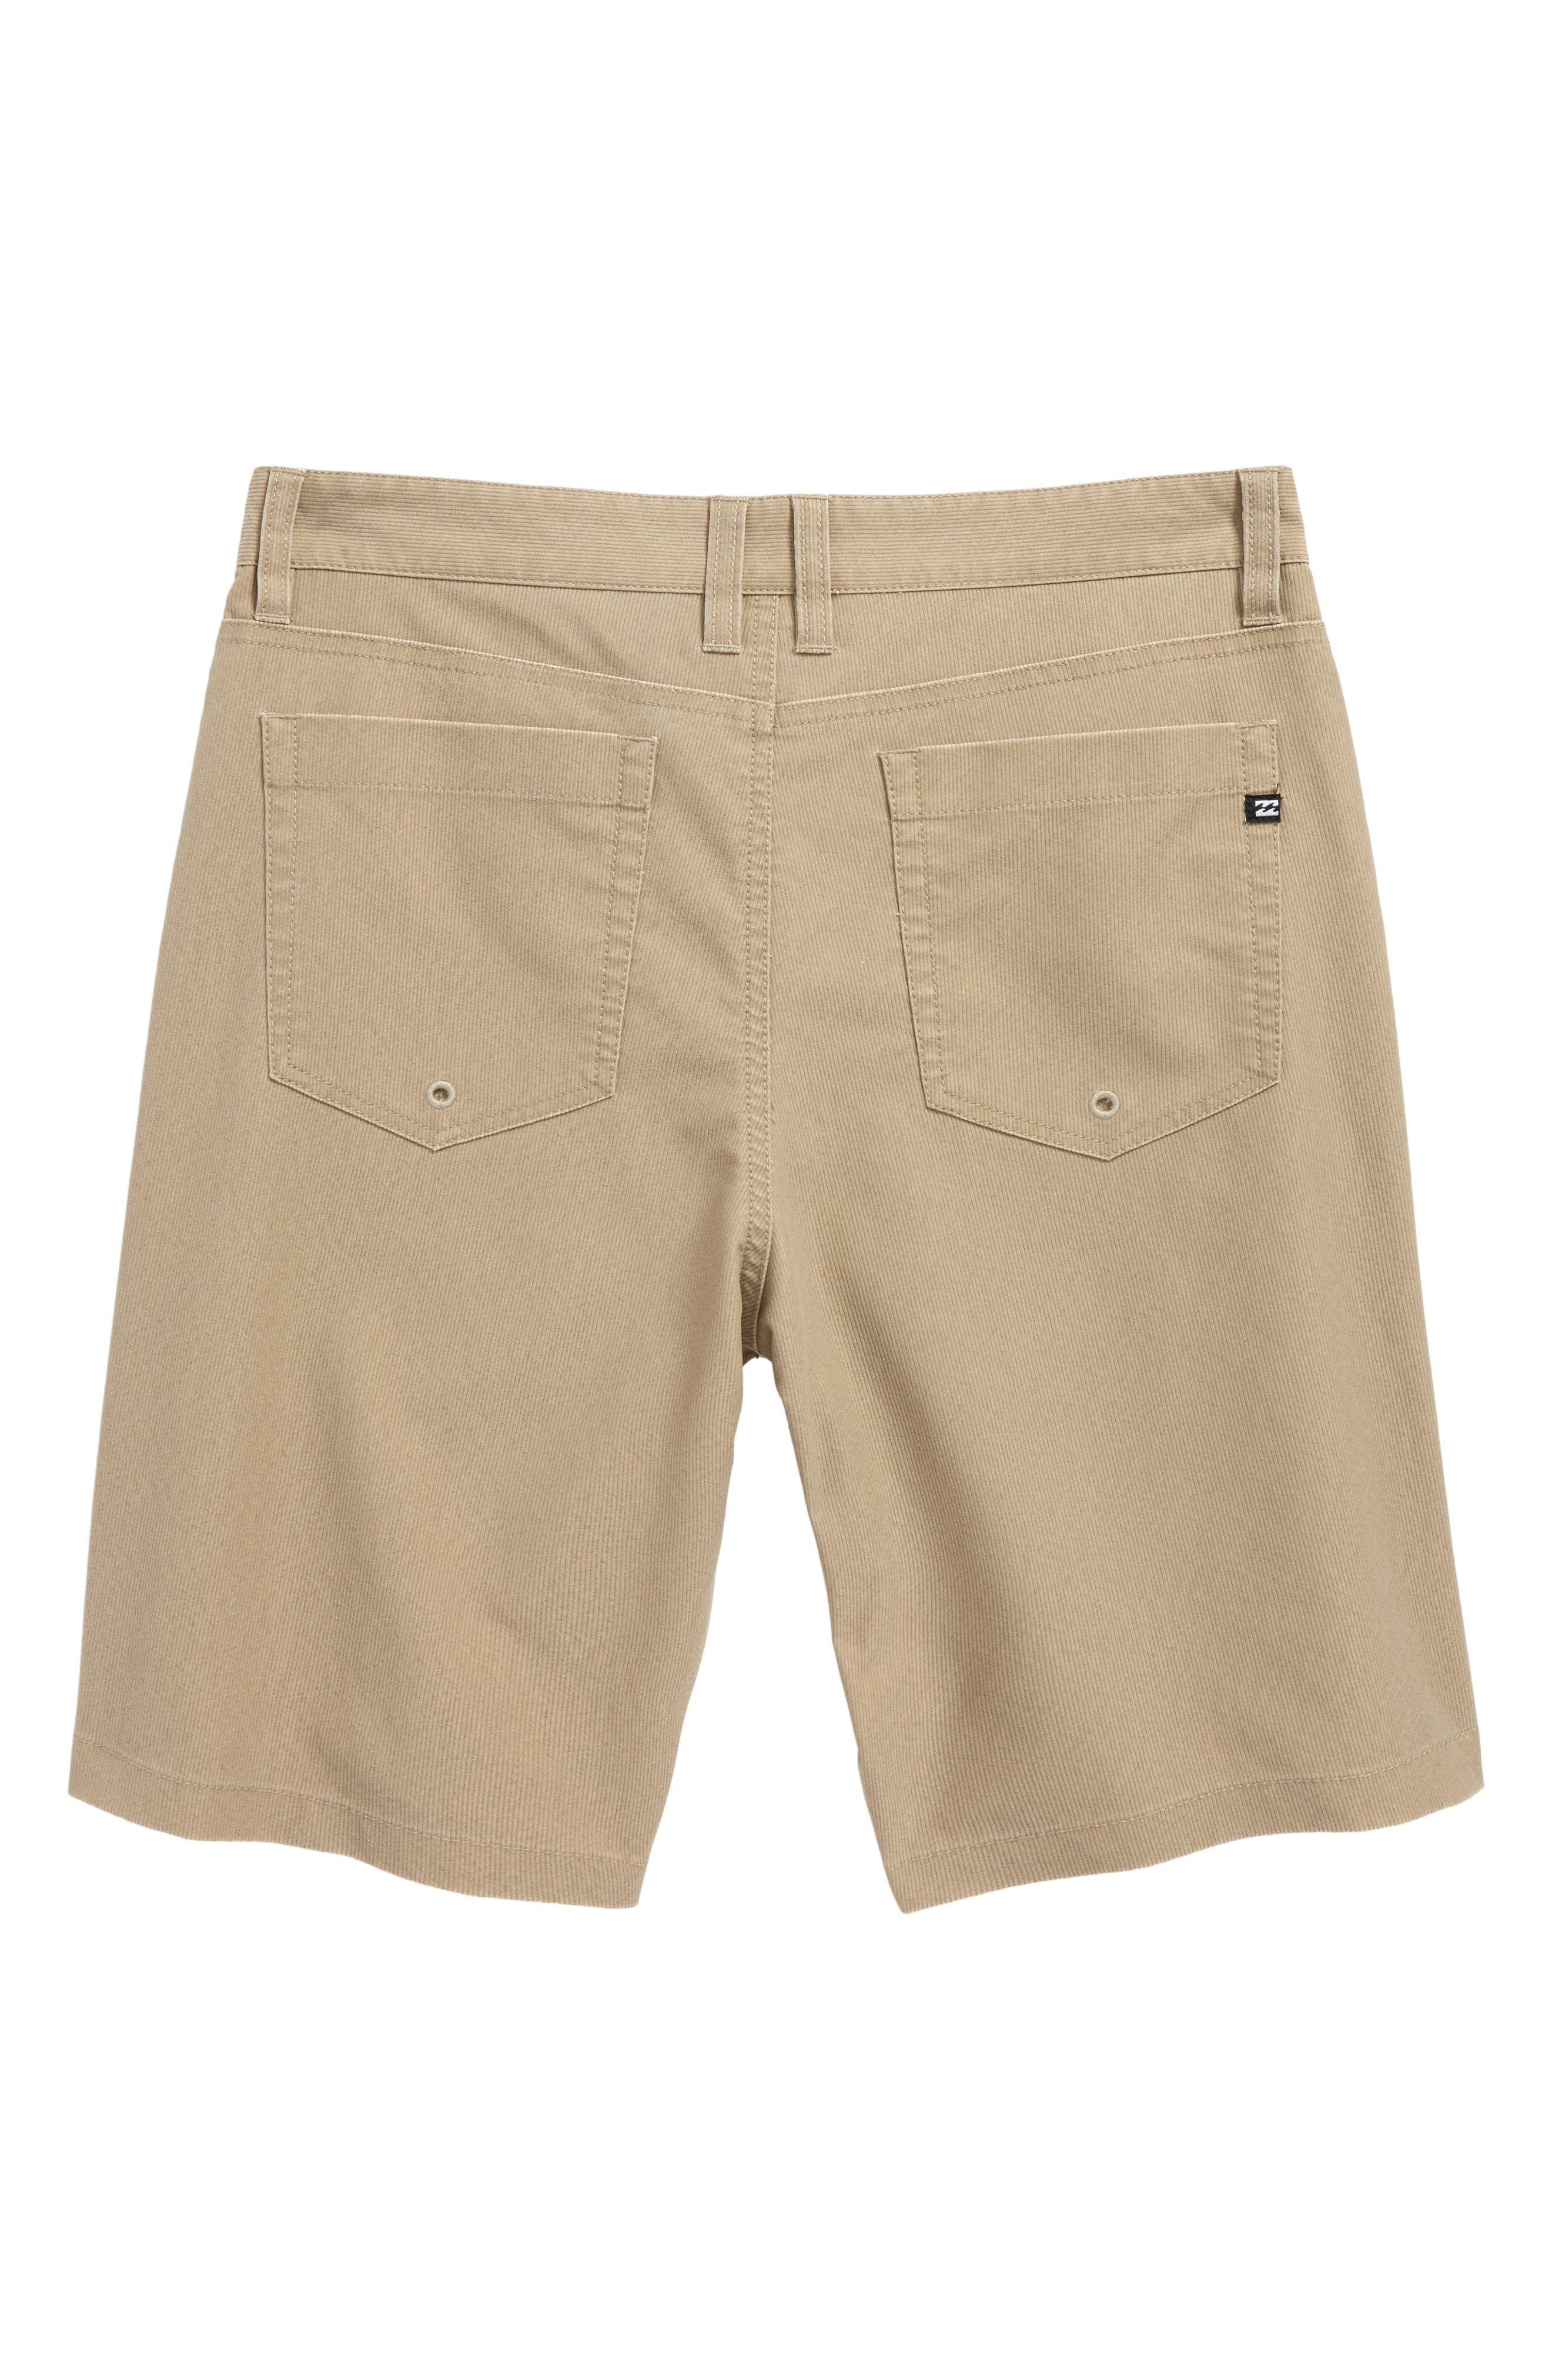 Outsider X Surf Corduroy Hybrid Shorts,                             Alternate thumbnail 2, color,                             Khaki